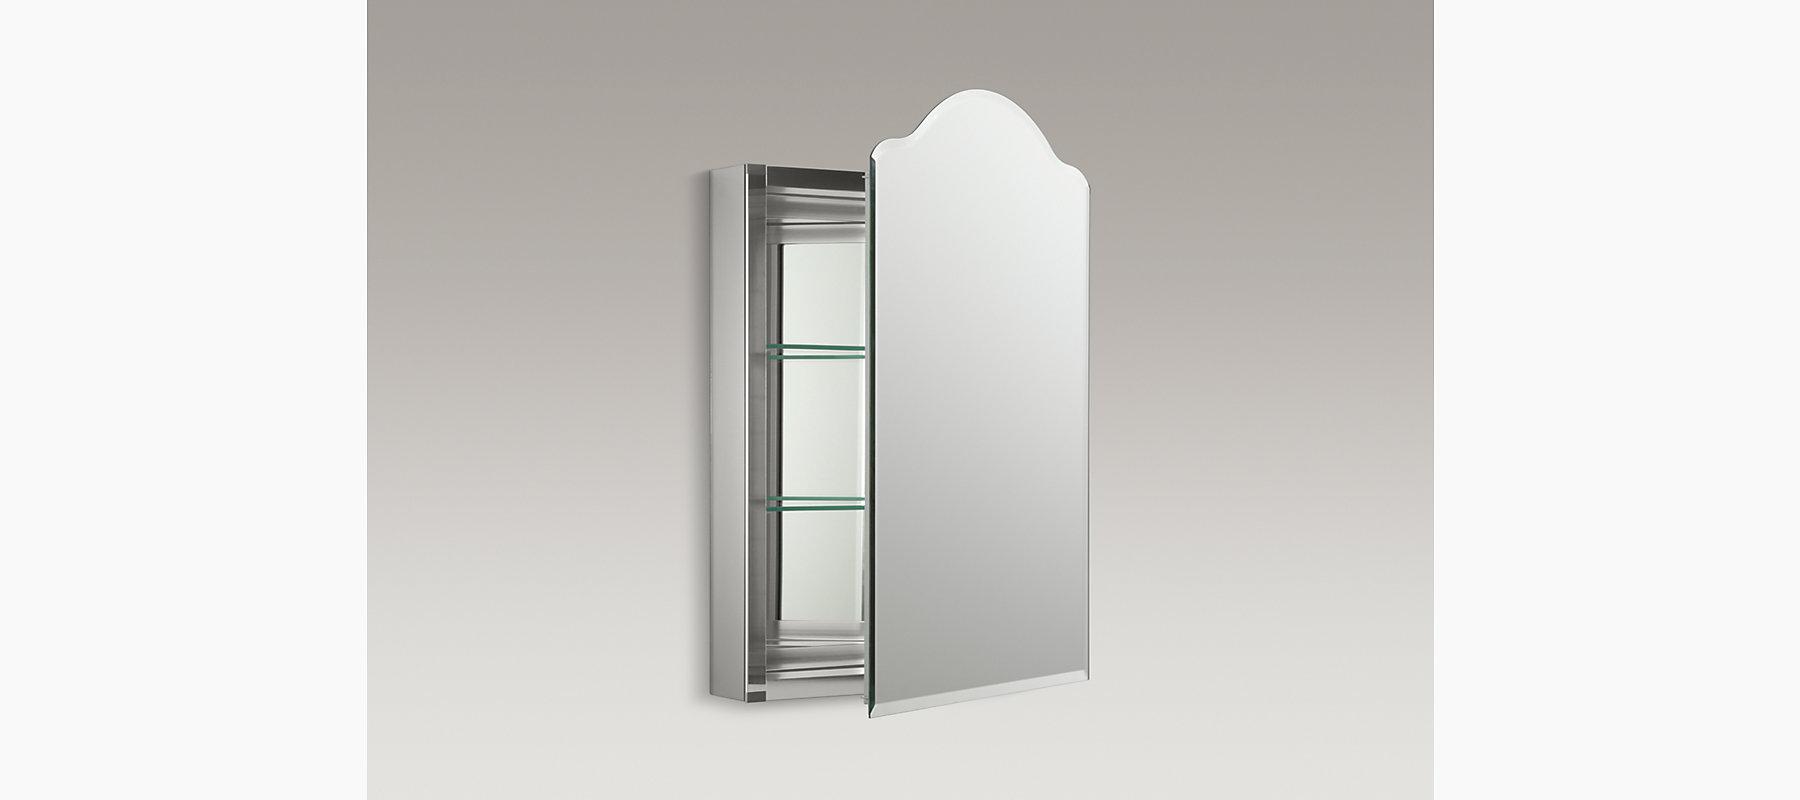 Vintage 20-Inch Medicine Cabinet With Mirrored Door